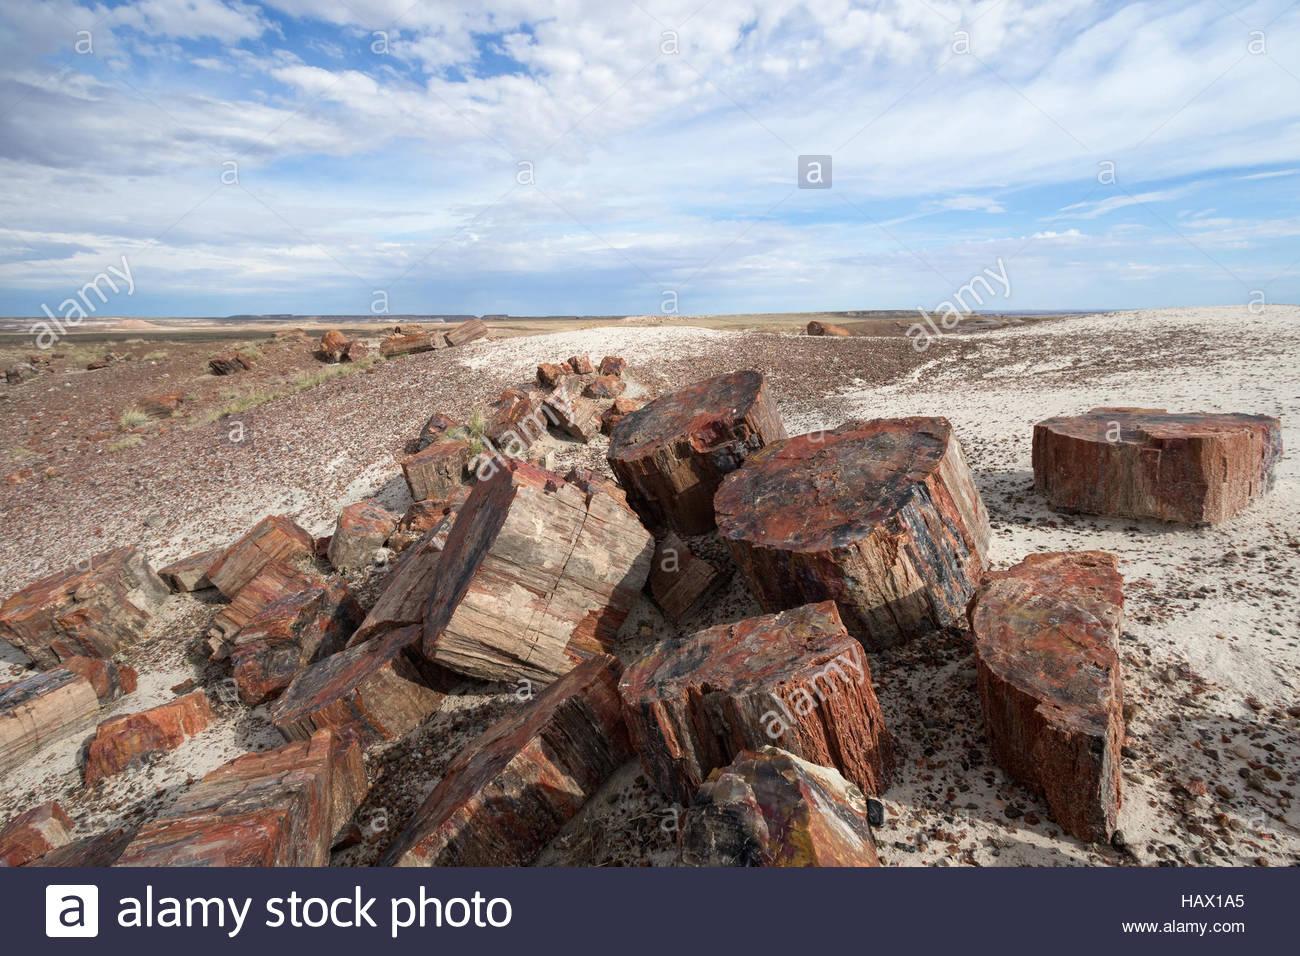 Petrified wood at Petrified Forest National Park, Arizona - Stock Image